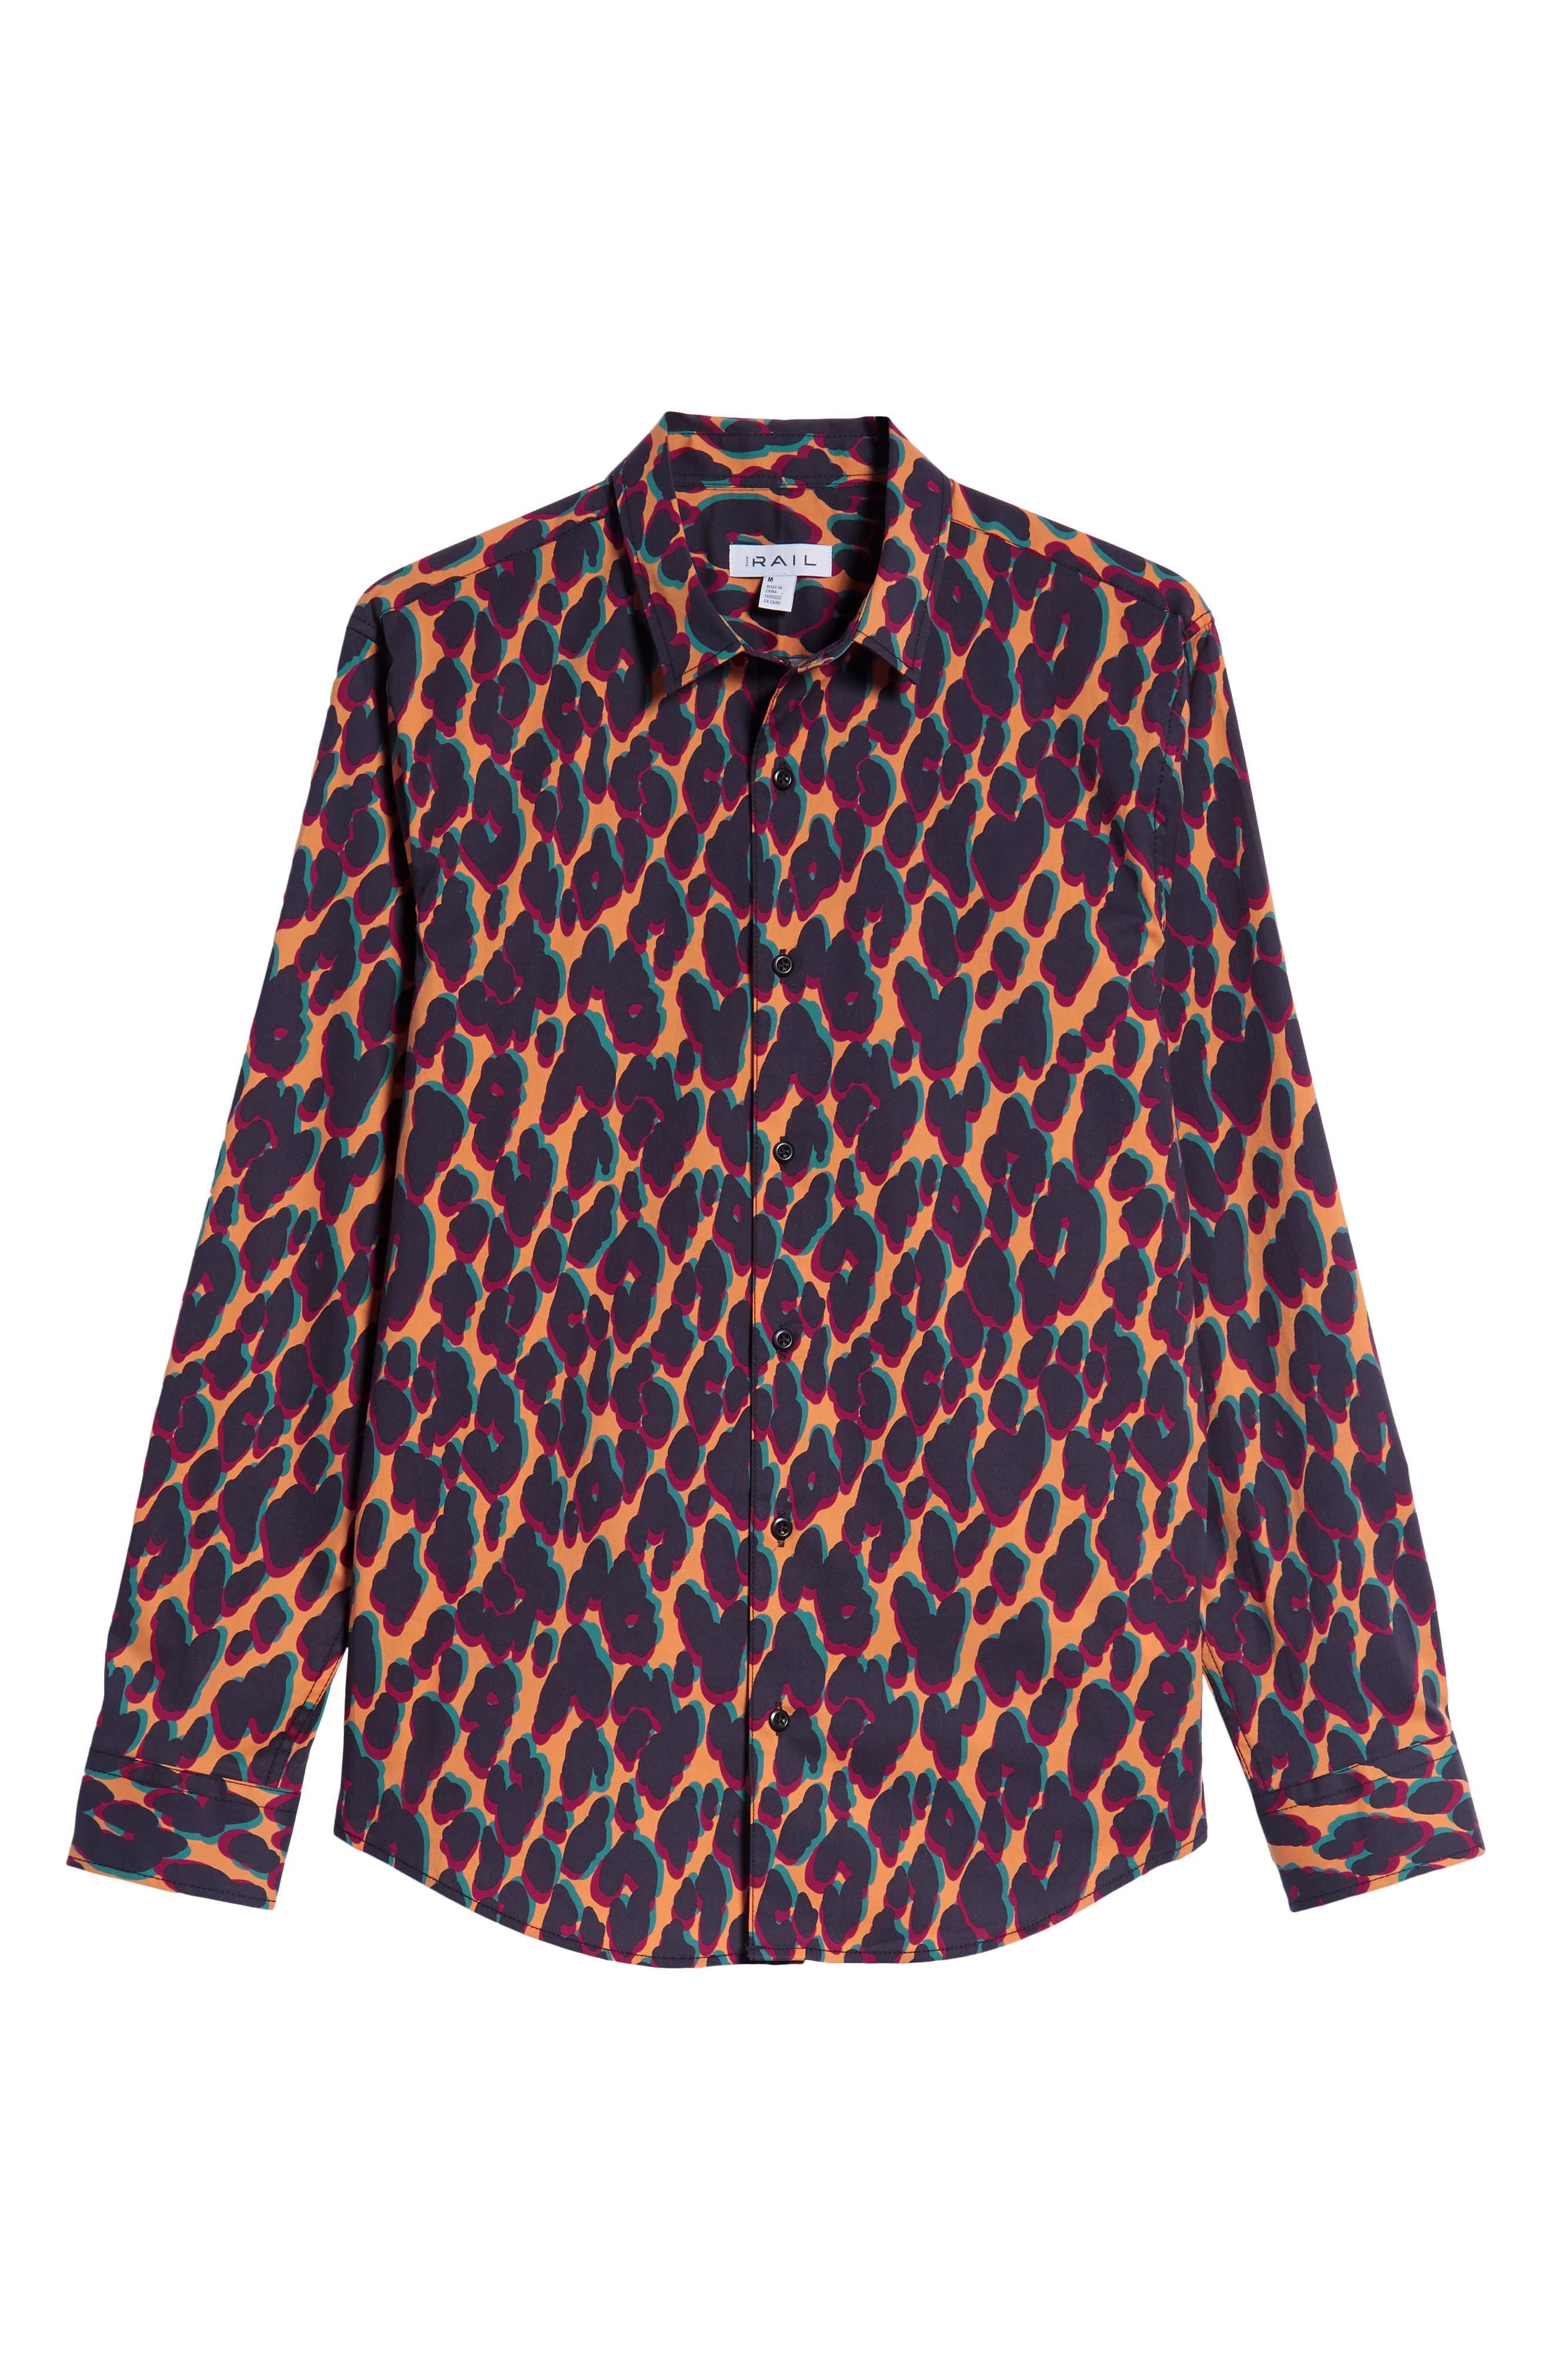 Leopard Print Sport Shirt,                             Alternate thumbnail 6, color,                             ORANGE LEOPARD OFFSET